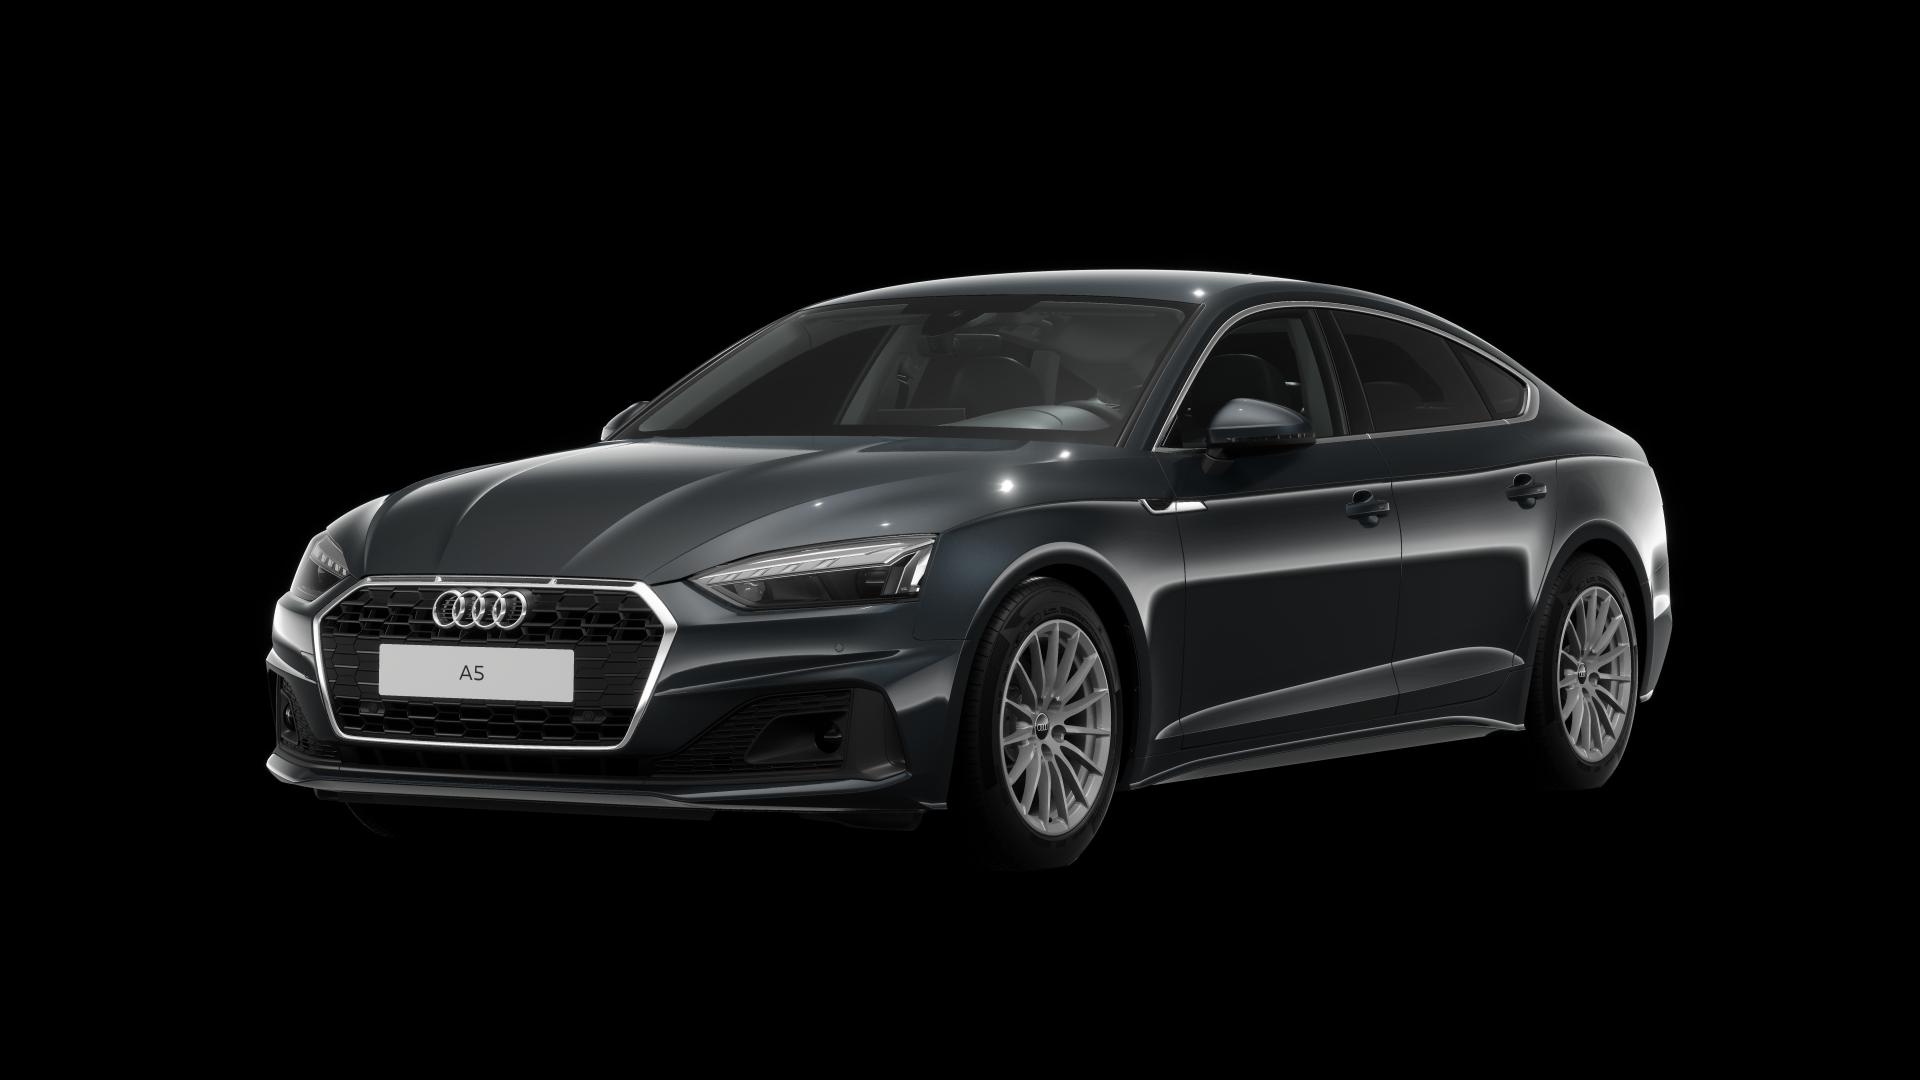 Audi A5 Sportback Business Edition 35 TDI  120(163) kW(pk) S tronic